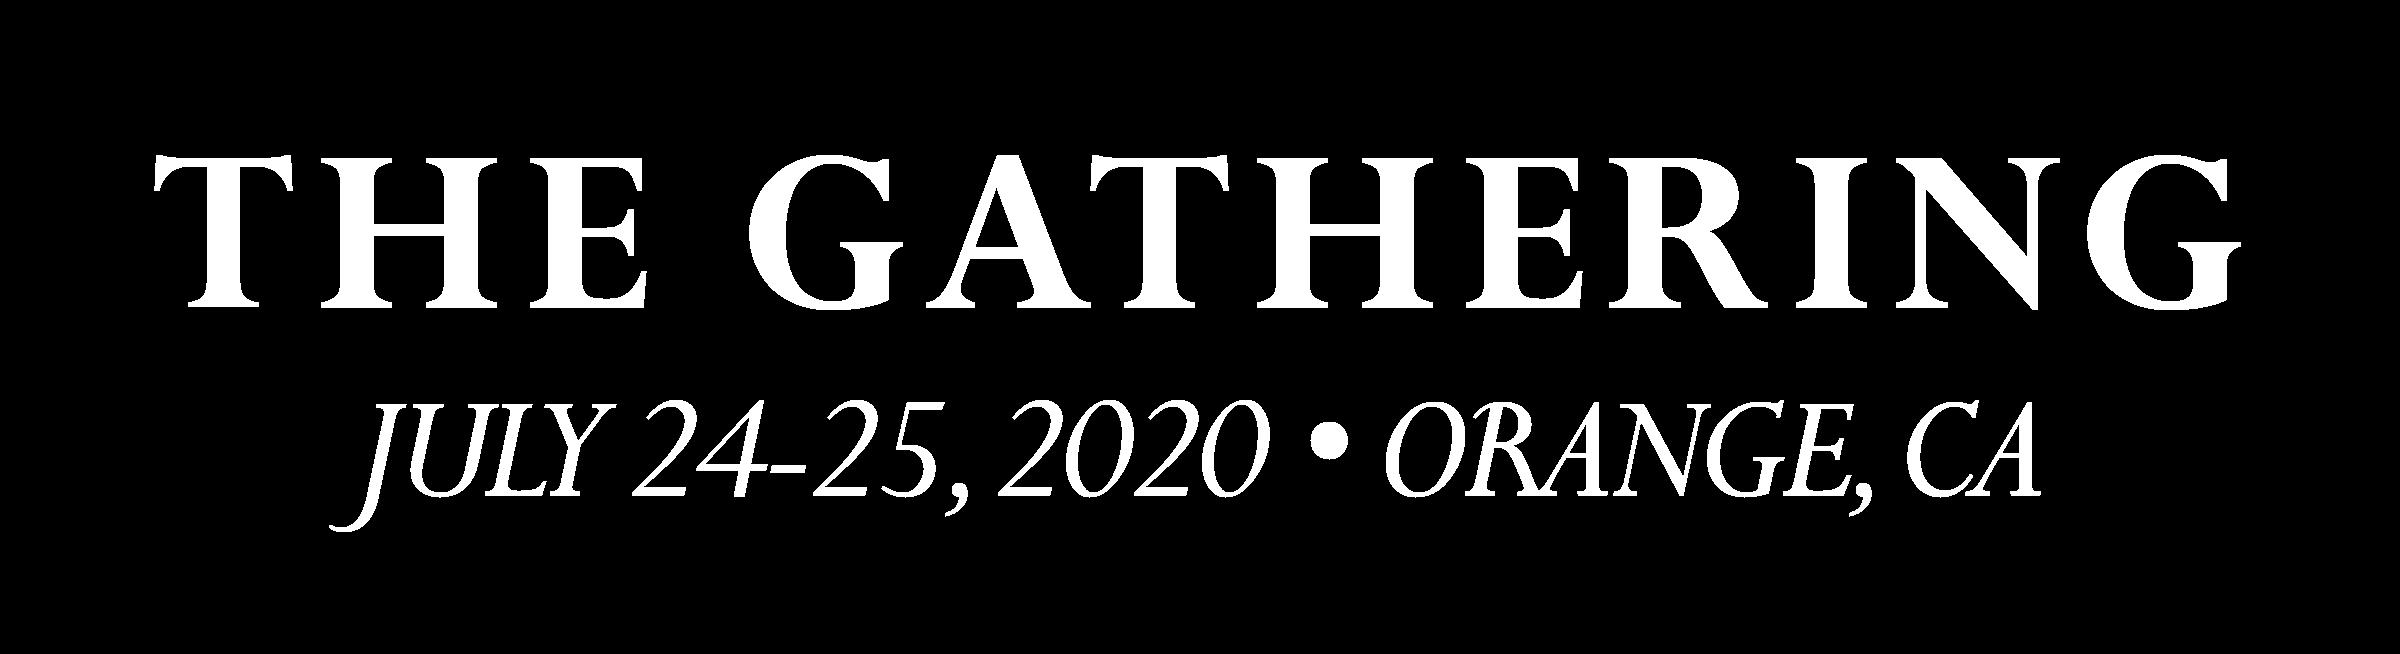 thegathering